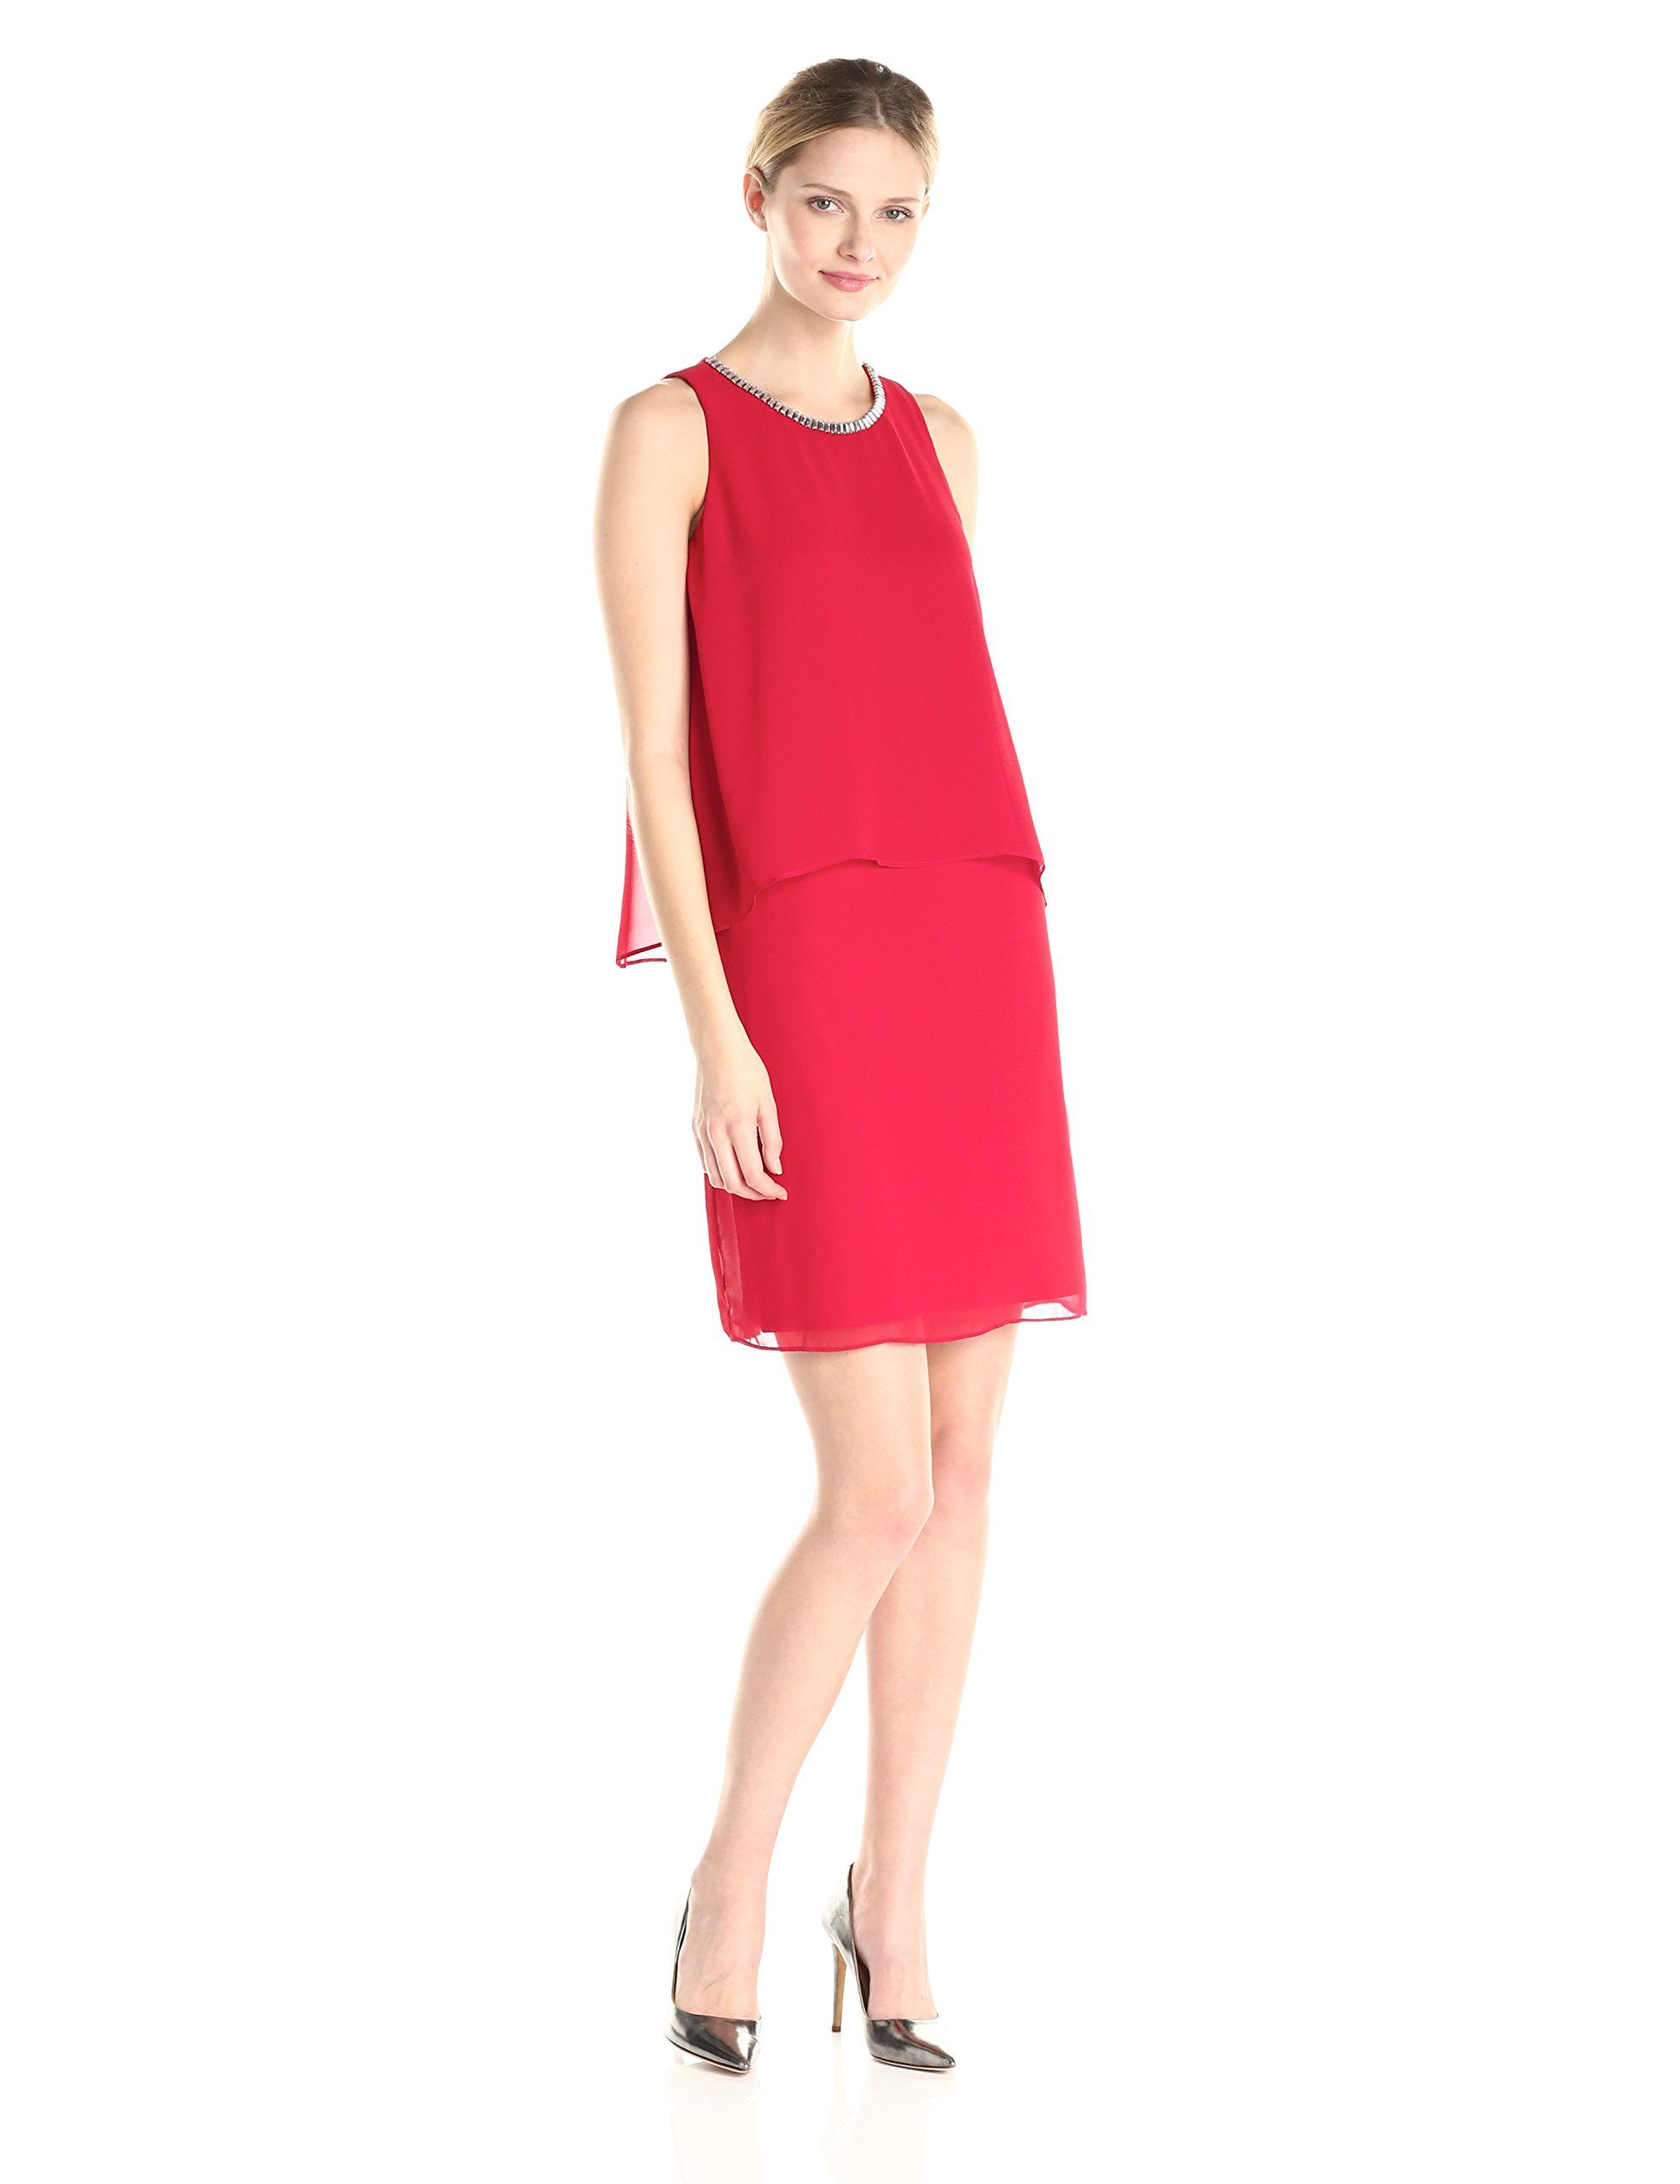 Women's Chain-Neck Overlay Dress